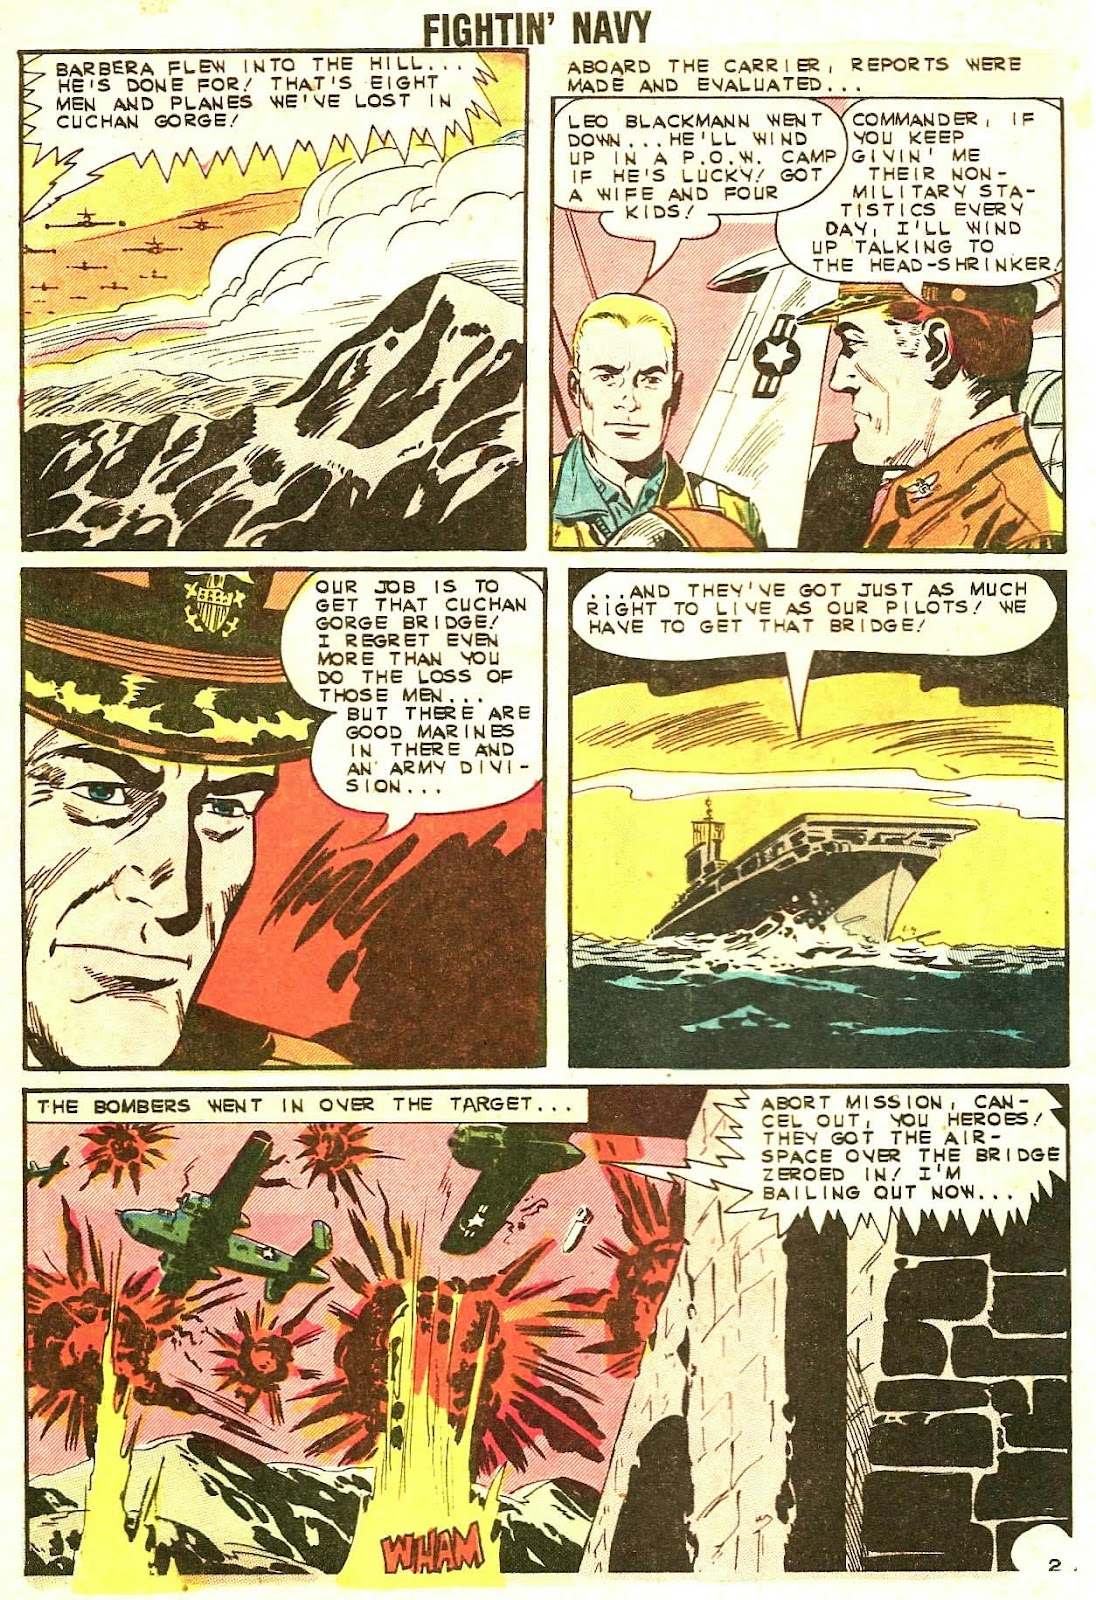 Read online Fightin' Navy comic -  Issue #110 - 28